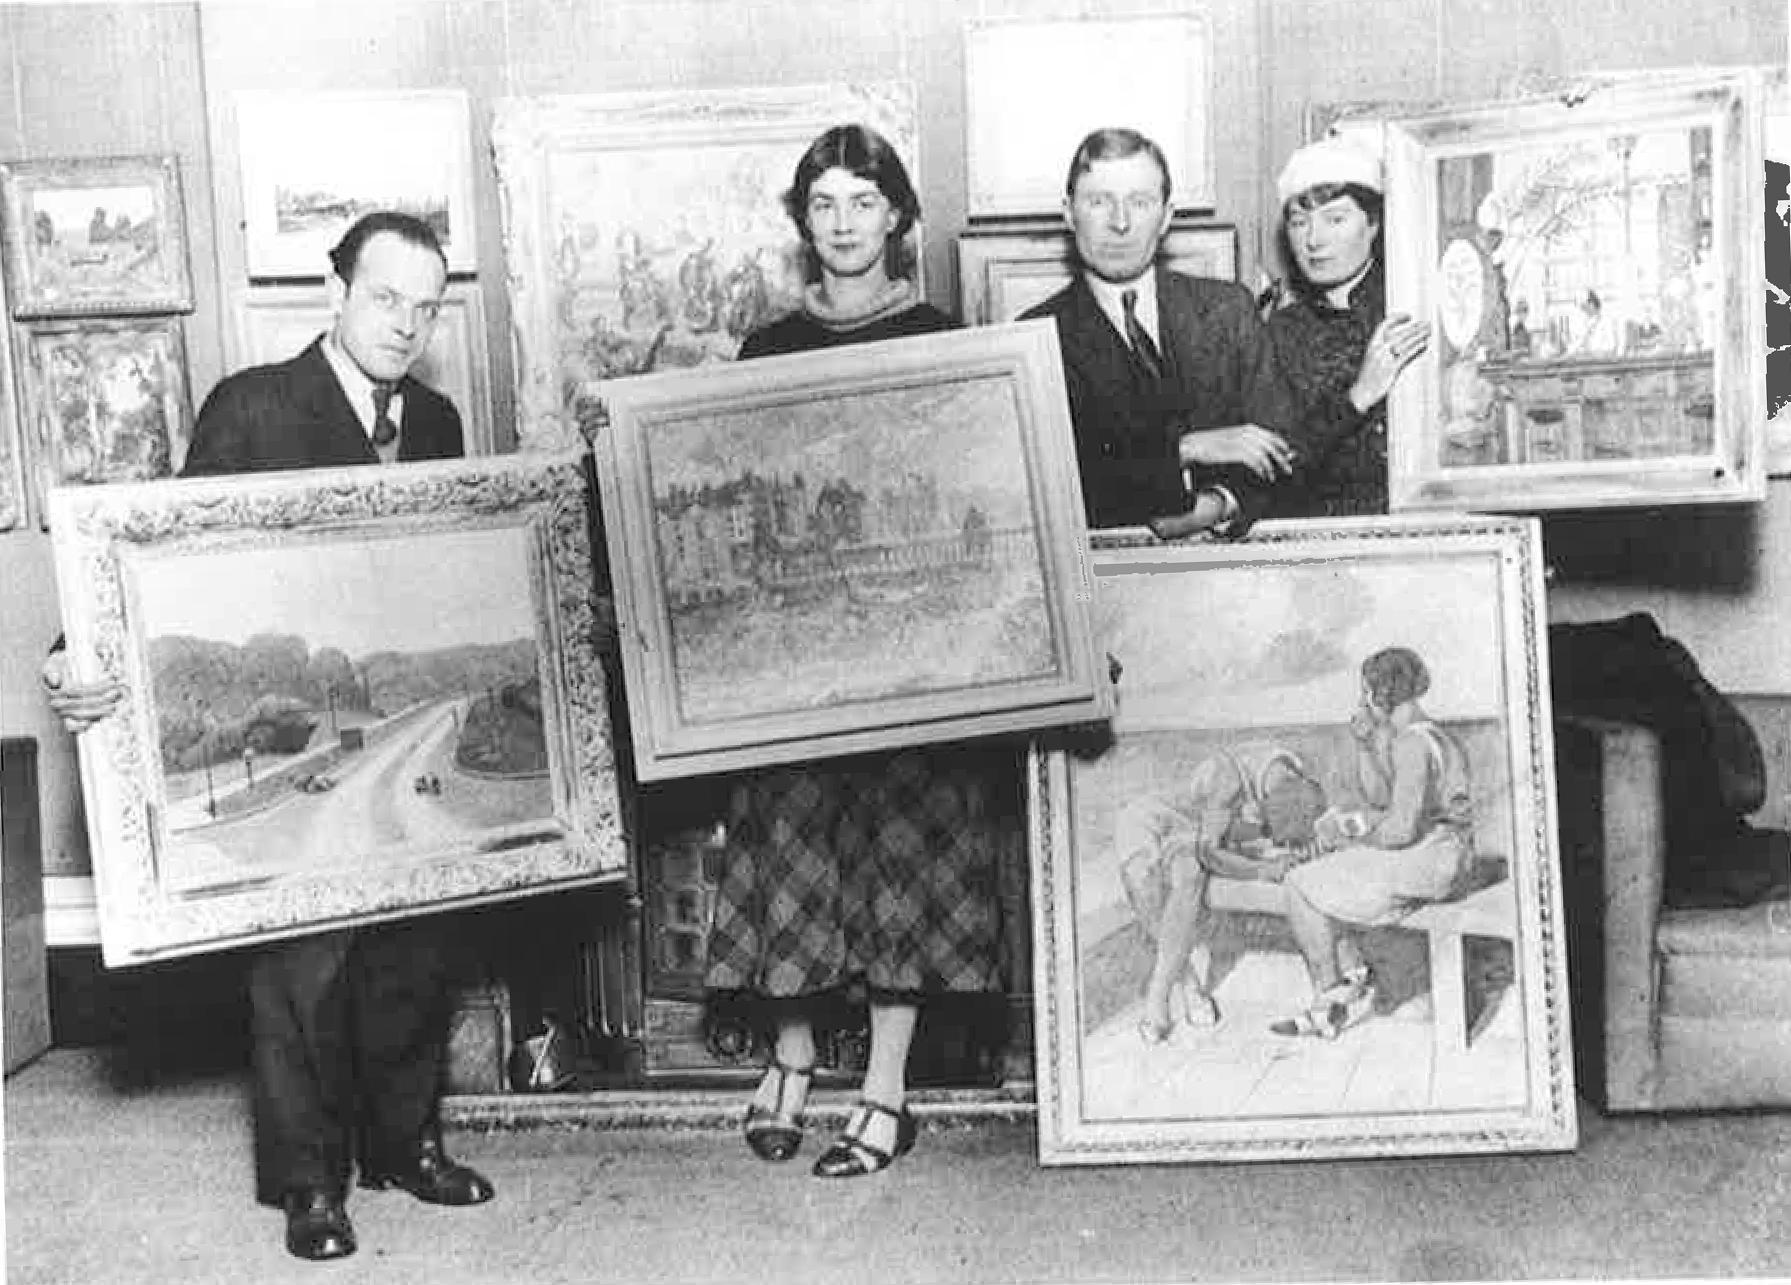 Elwin-Hawthorne-Phyllis-Bray-John-Cooper-Brynhild-Parker-at-Lefevre-Galleries-1932.jpg